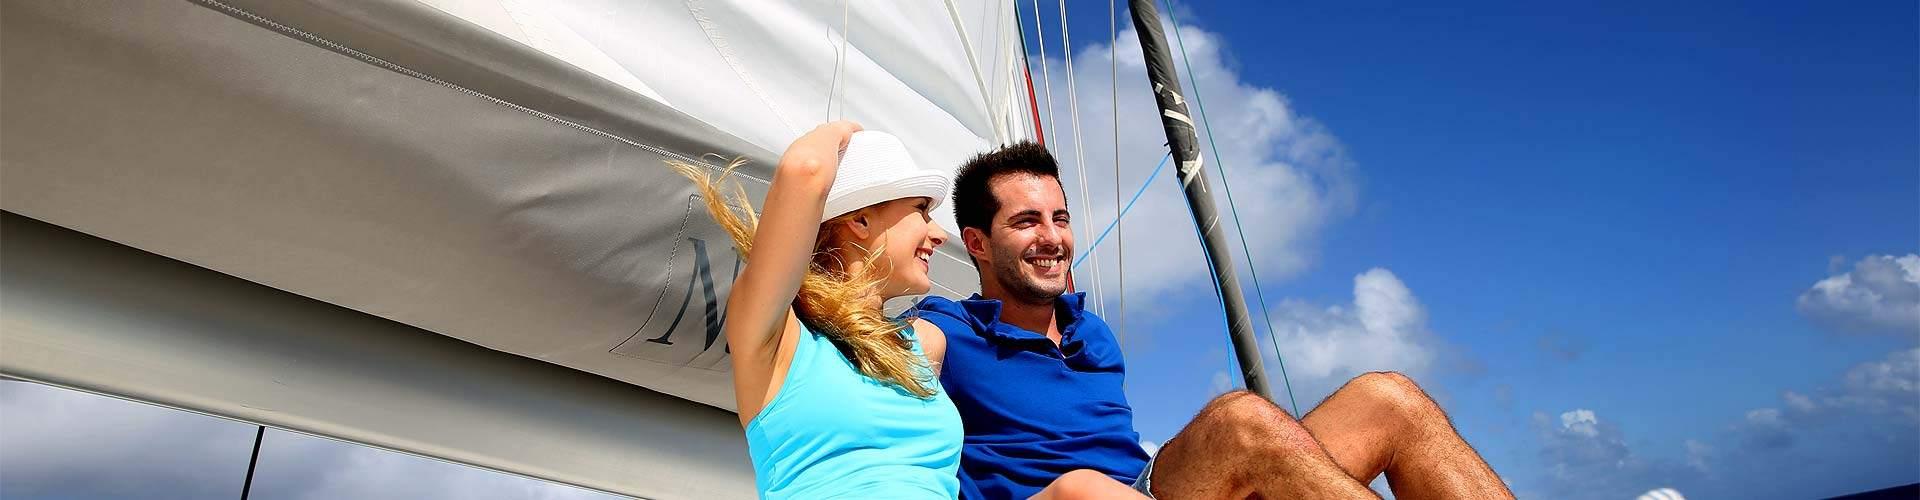 alquiler de veleros en centrosdeportes de Vilanova del Vallès